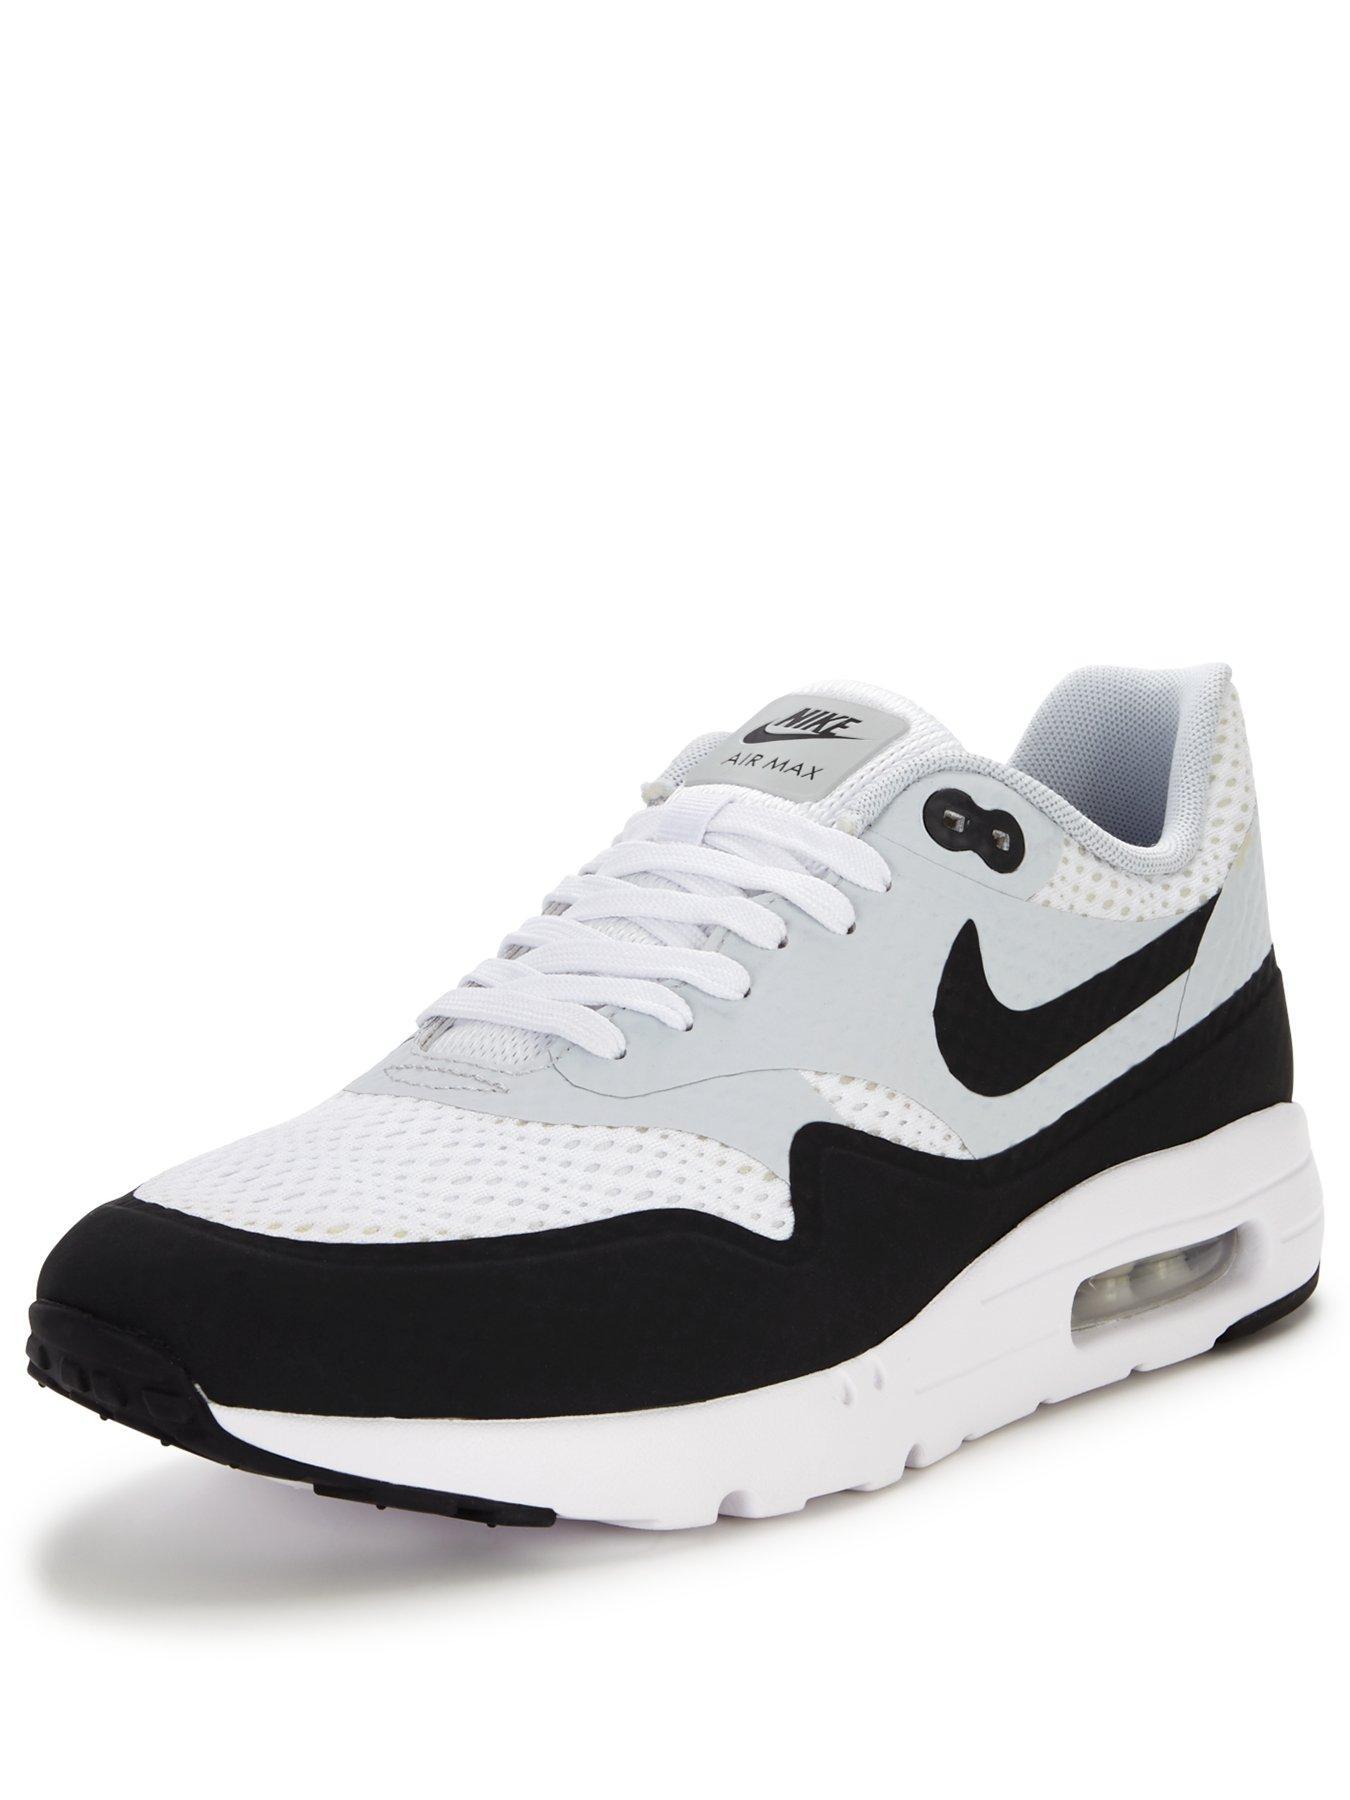 Wmns Nike Air Max Thea Gm RoyalWhite Pnk Glw Wlf Gry